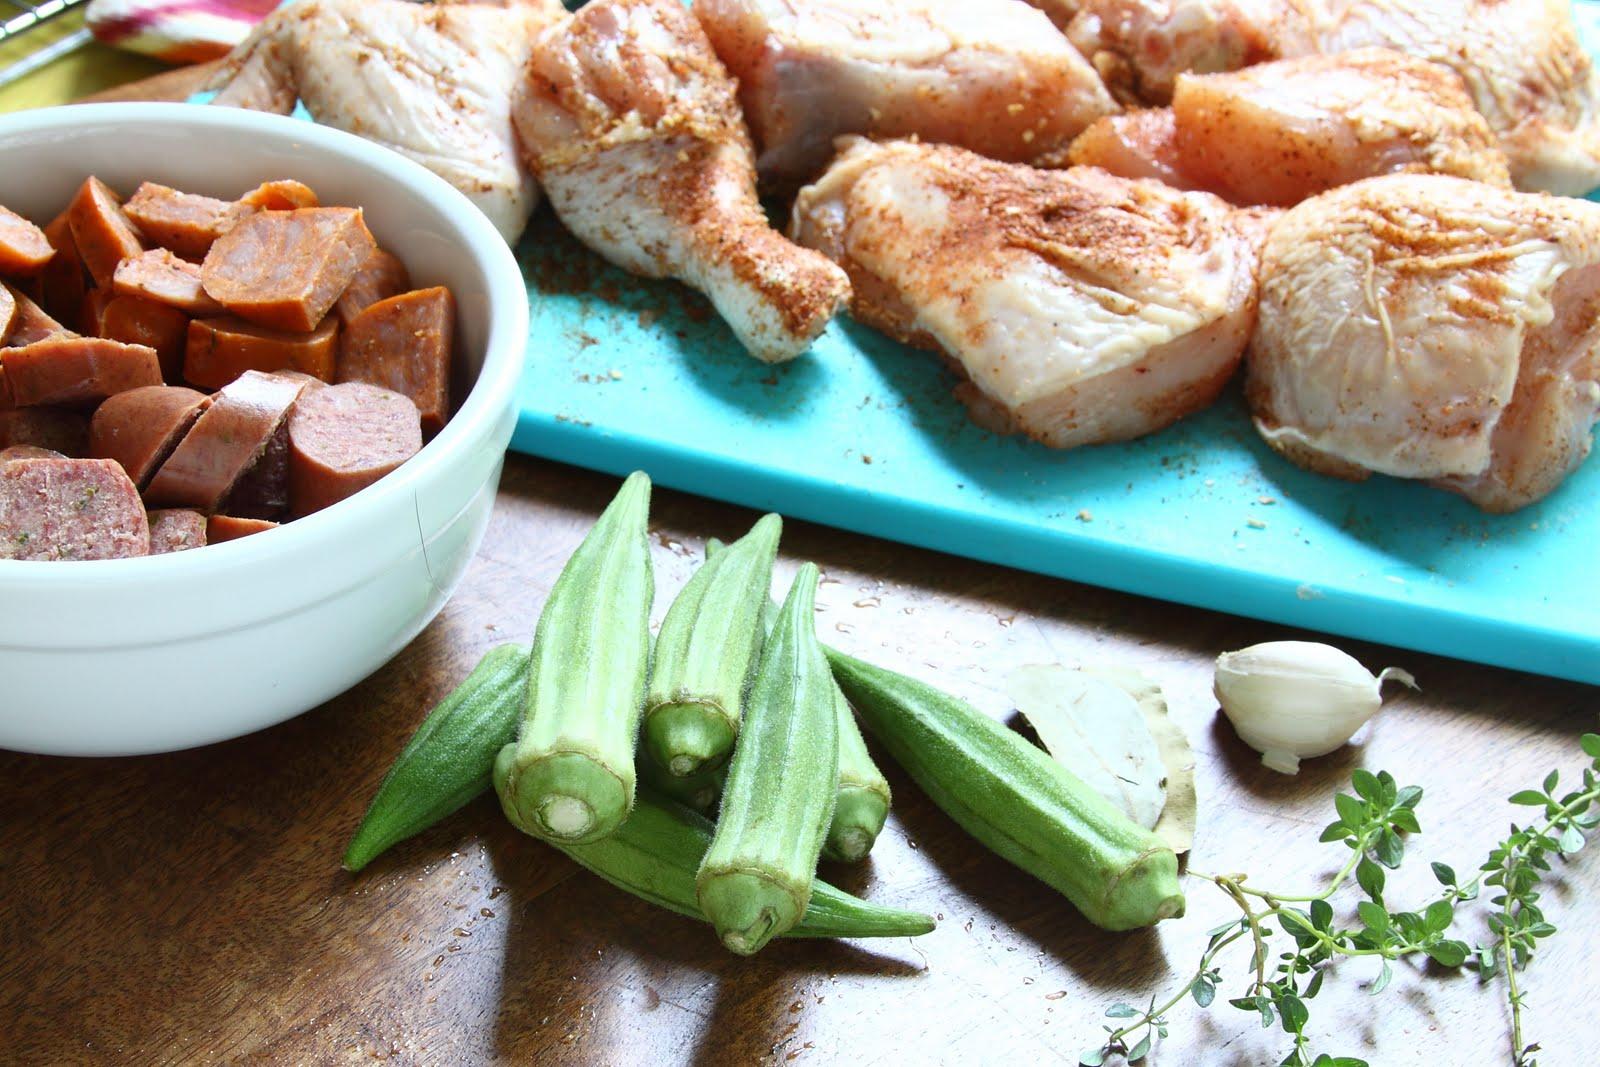 ShowFood Chef: Real Good Gumbo - Daring Cooks